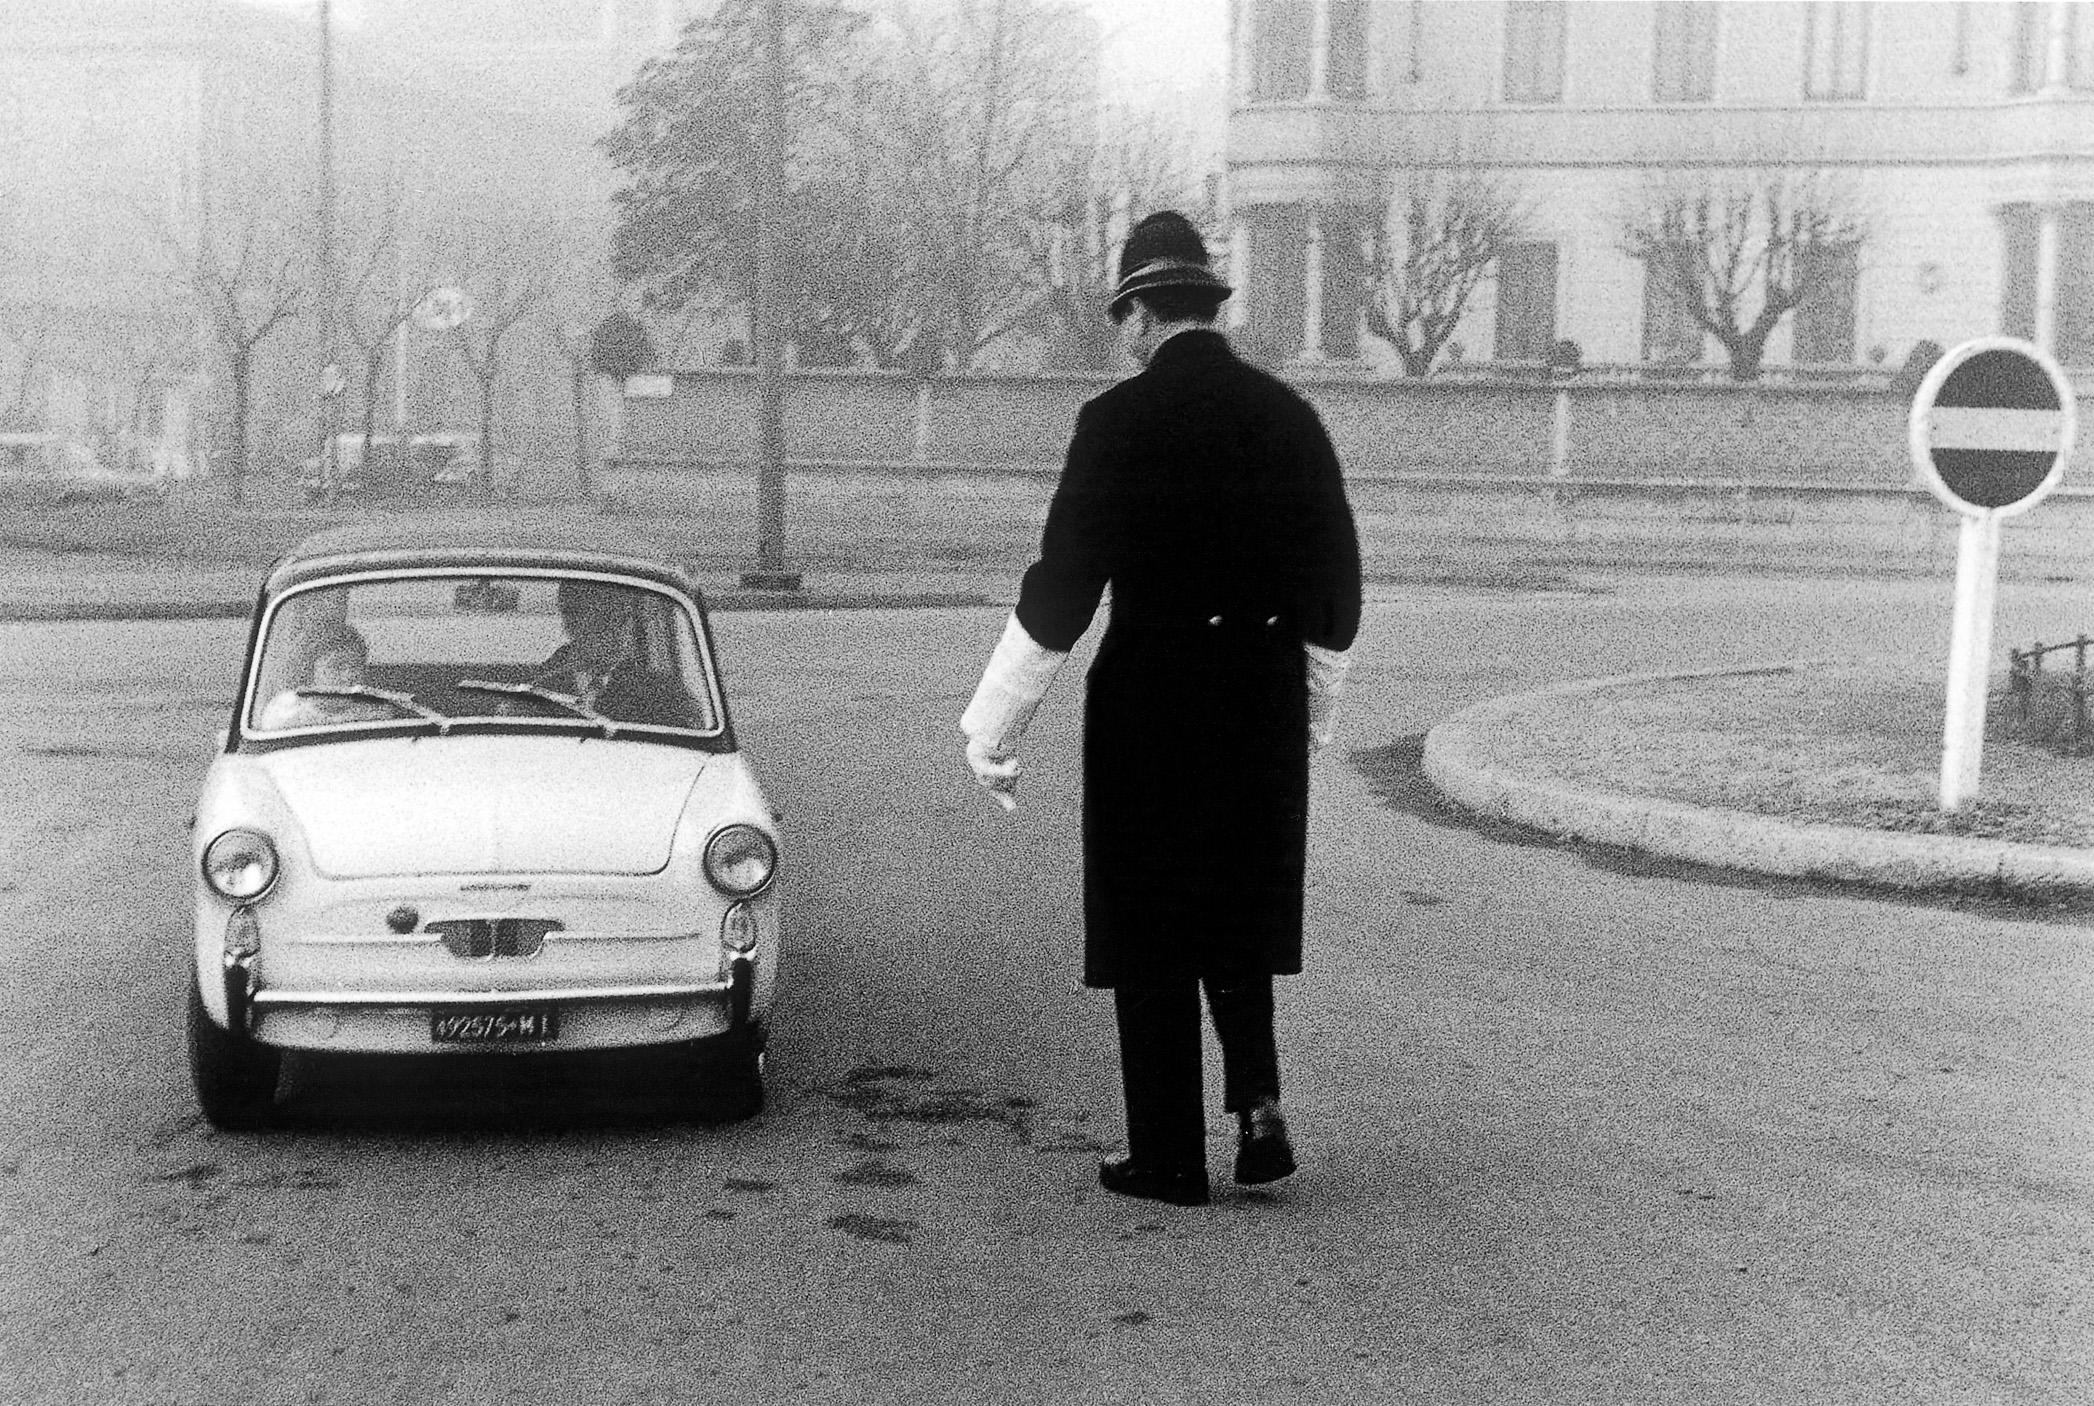 gianni_berengo_gardin_milano_1959.jpg